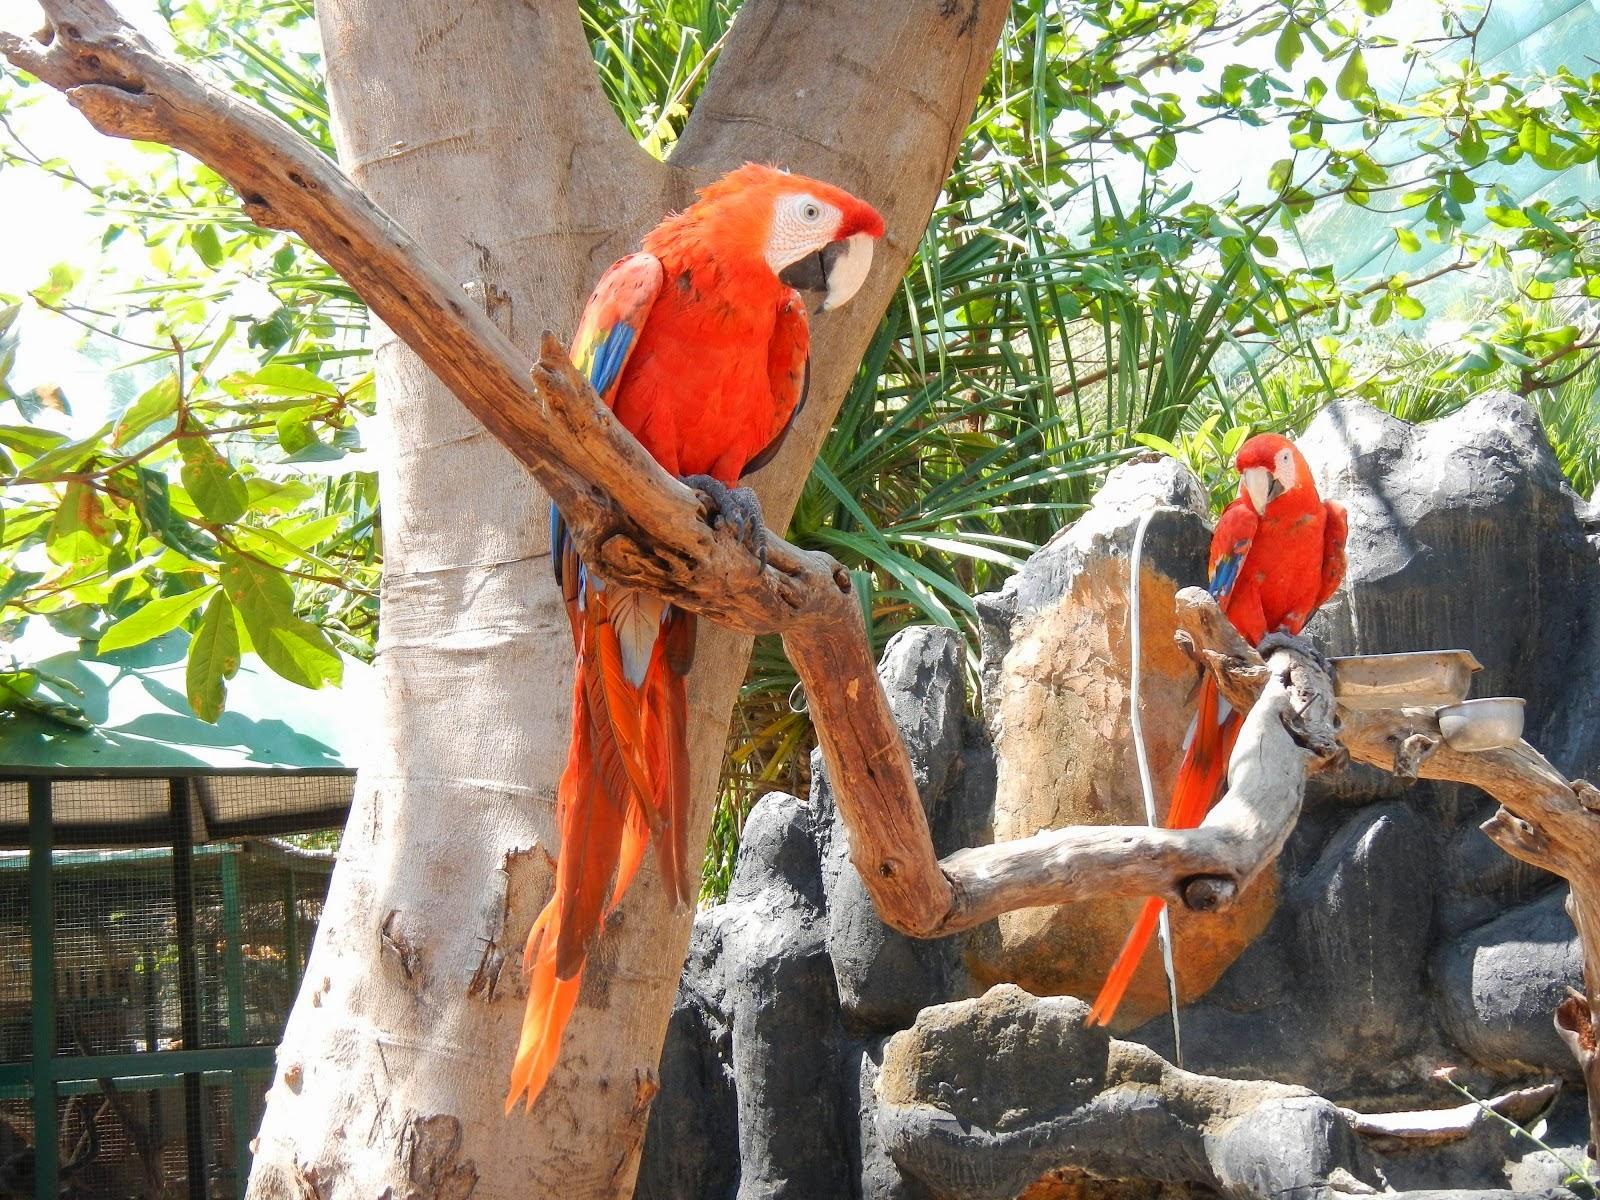 bird park, wisata di gili meno, gili meno lombok, tempat wisata di lombok, wisata lombok